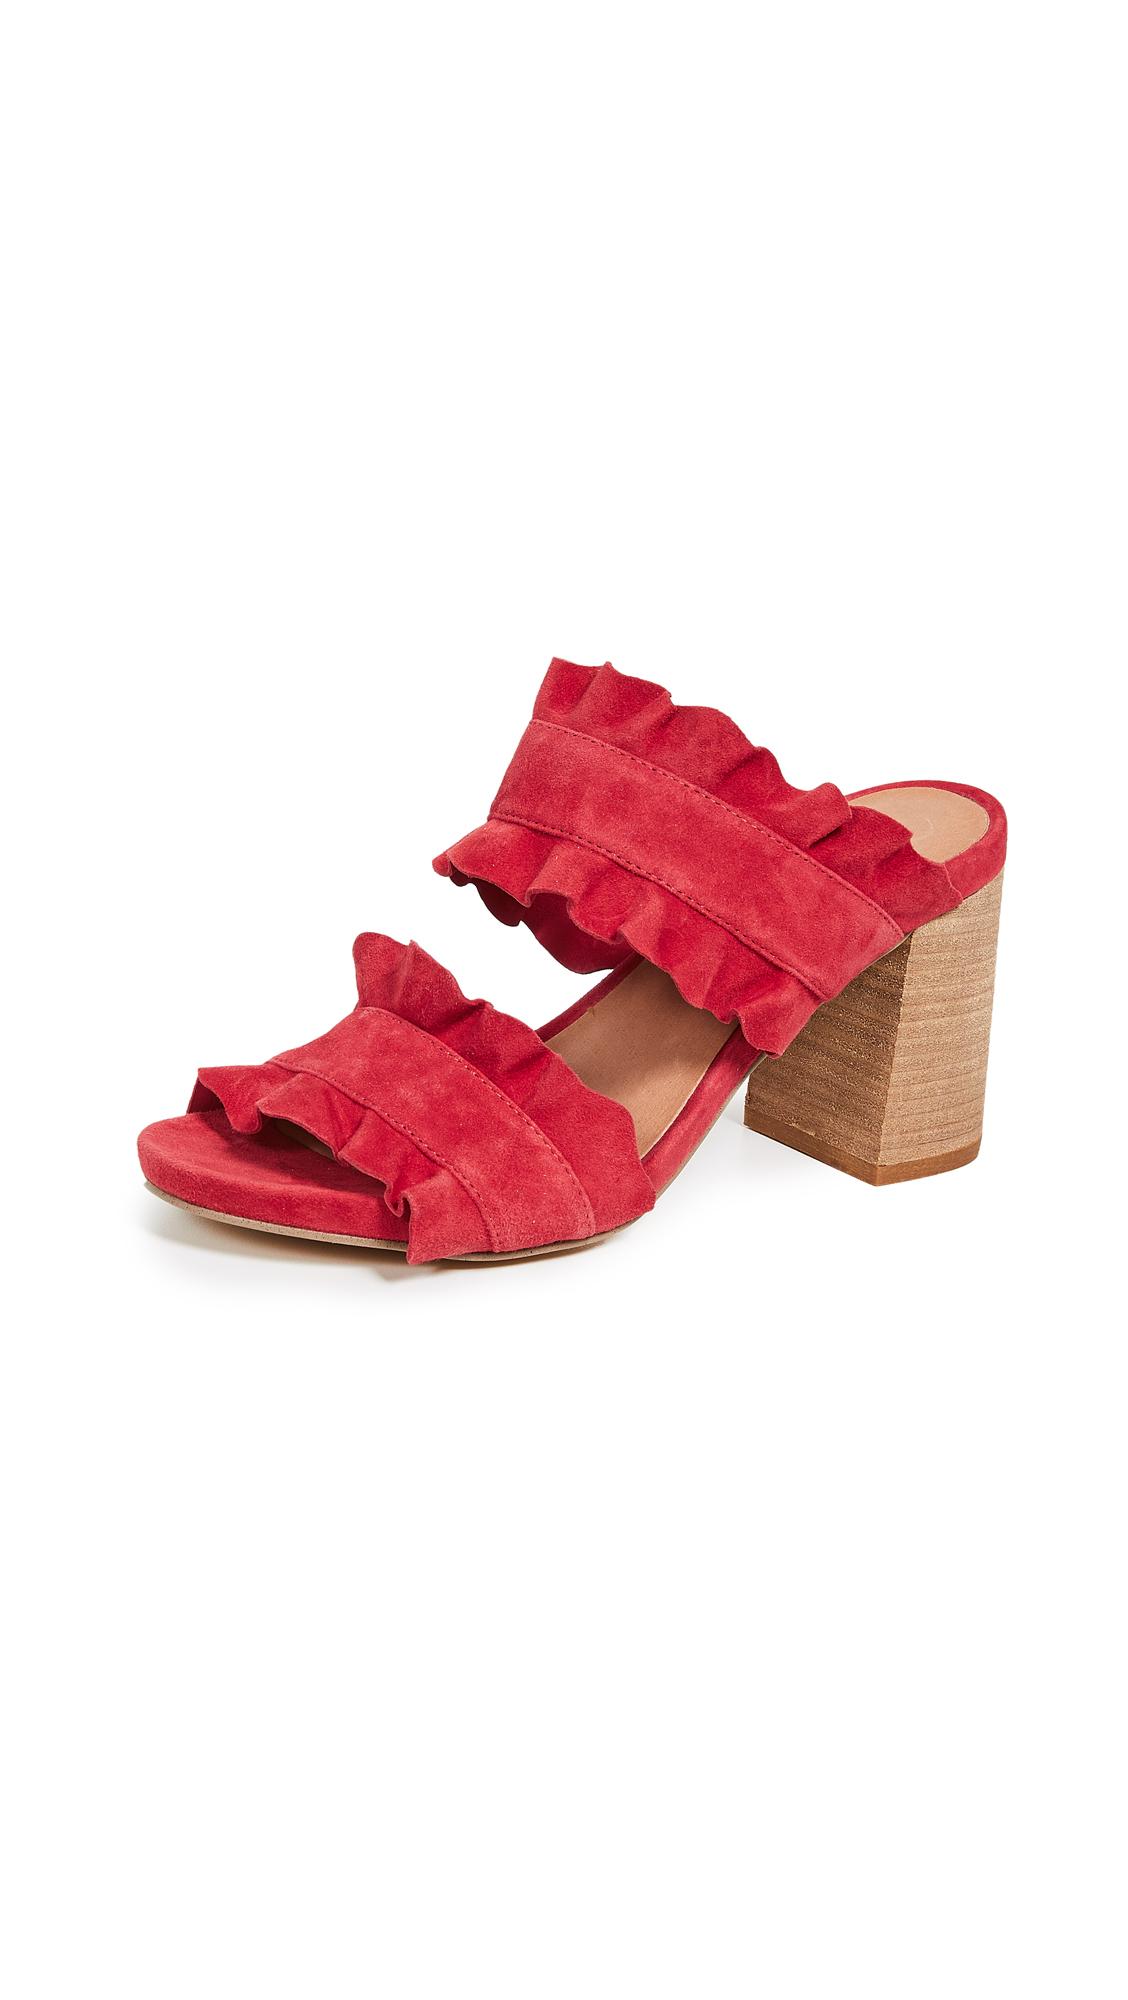 Free People Rosie Ruffle Mules - Red